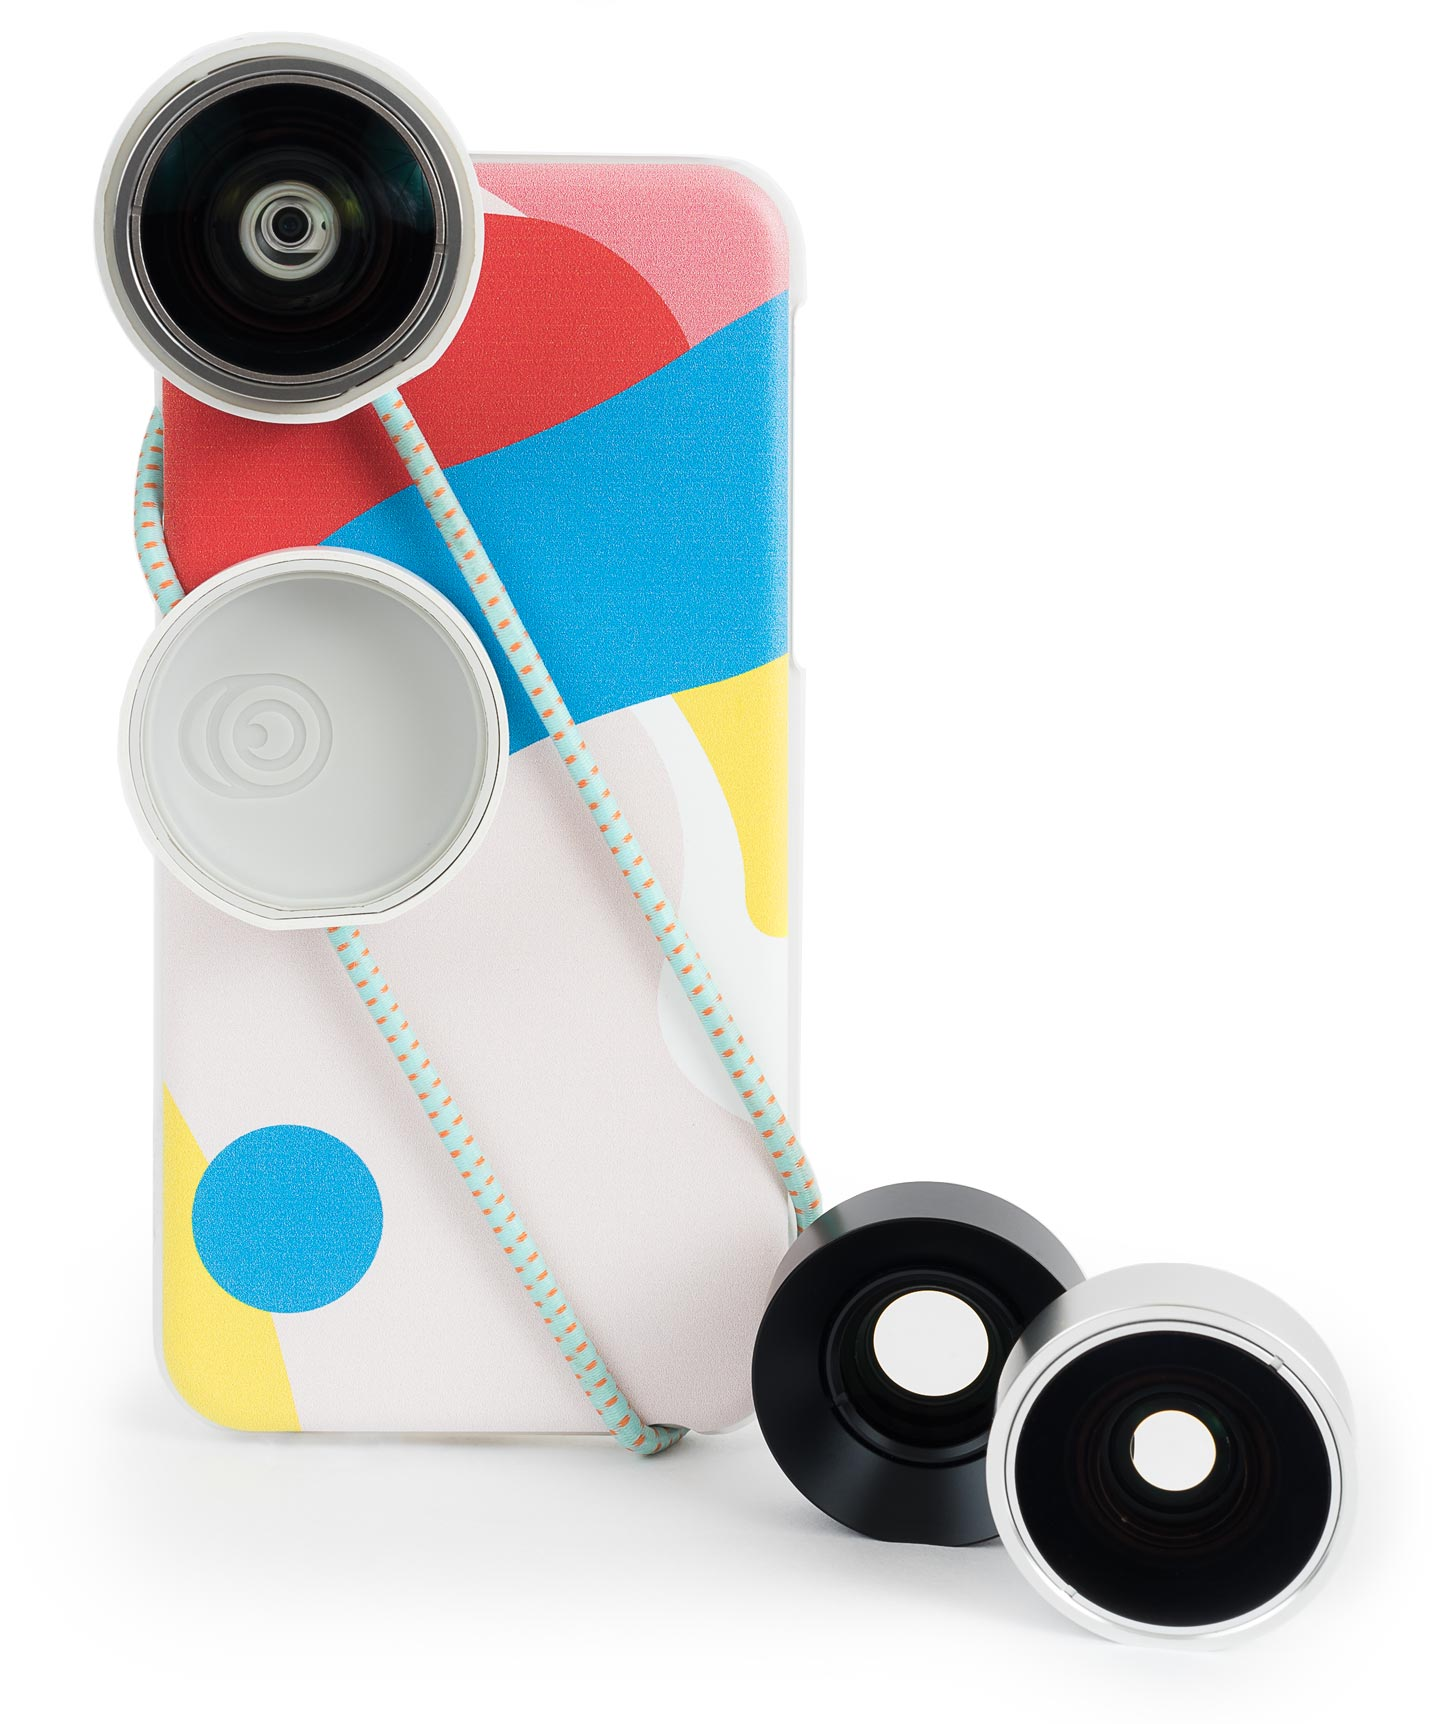 Photojojo Iris Smartphone Lenses